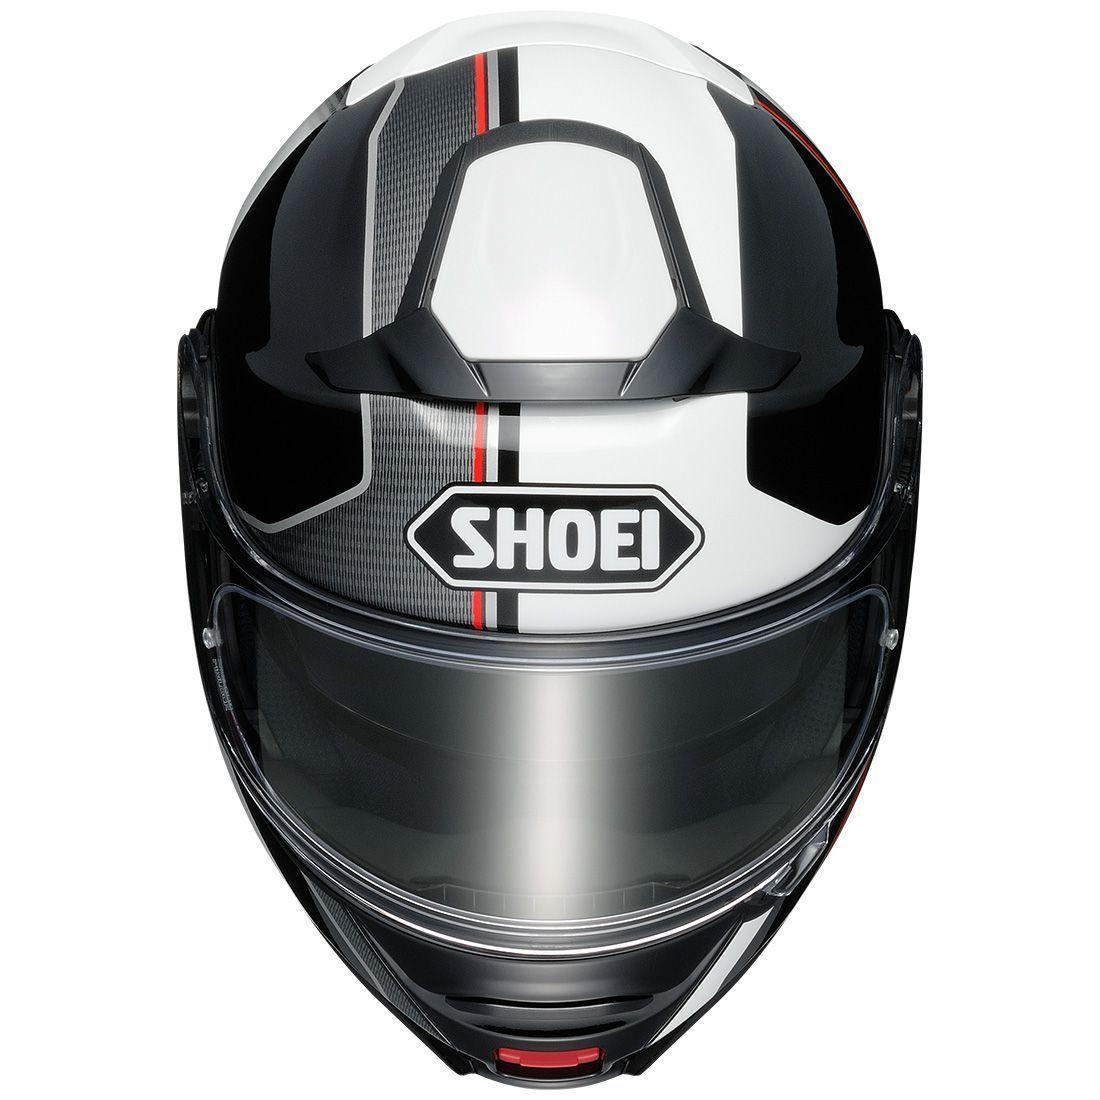 Capacete Shoei Neotec 2 Excursion TC-6 Escamoteável  - Nova Centro Boutique Roupas para Motociclistas